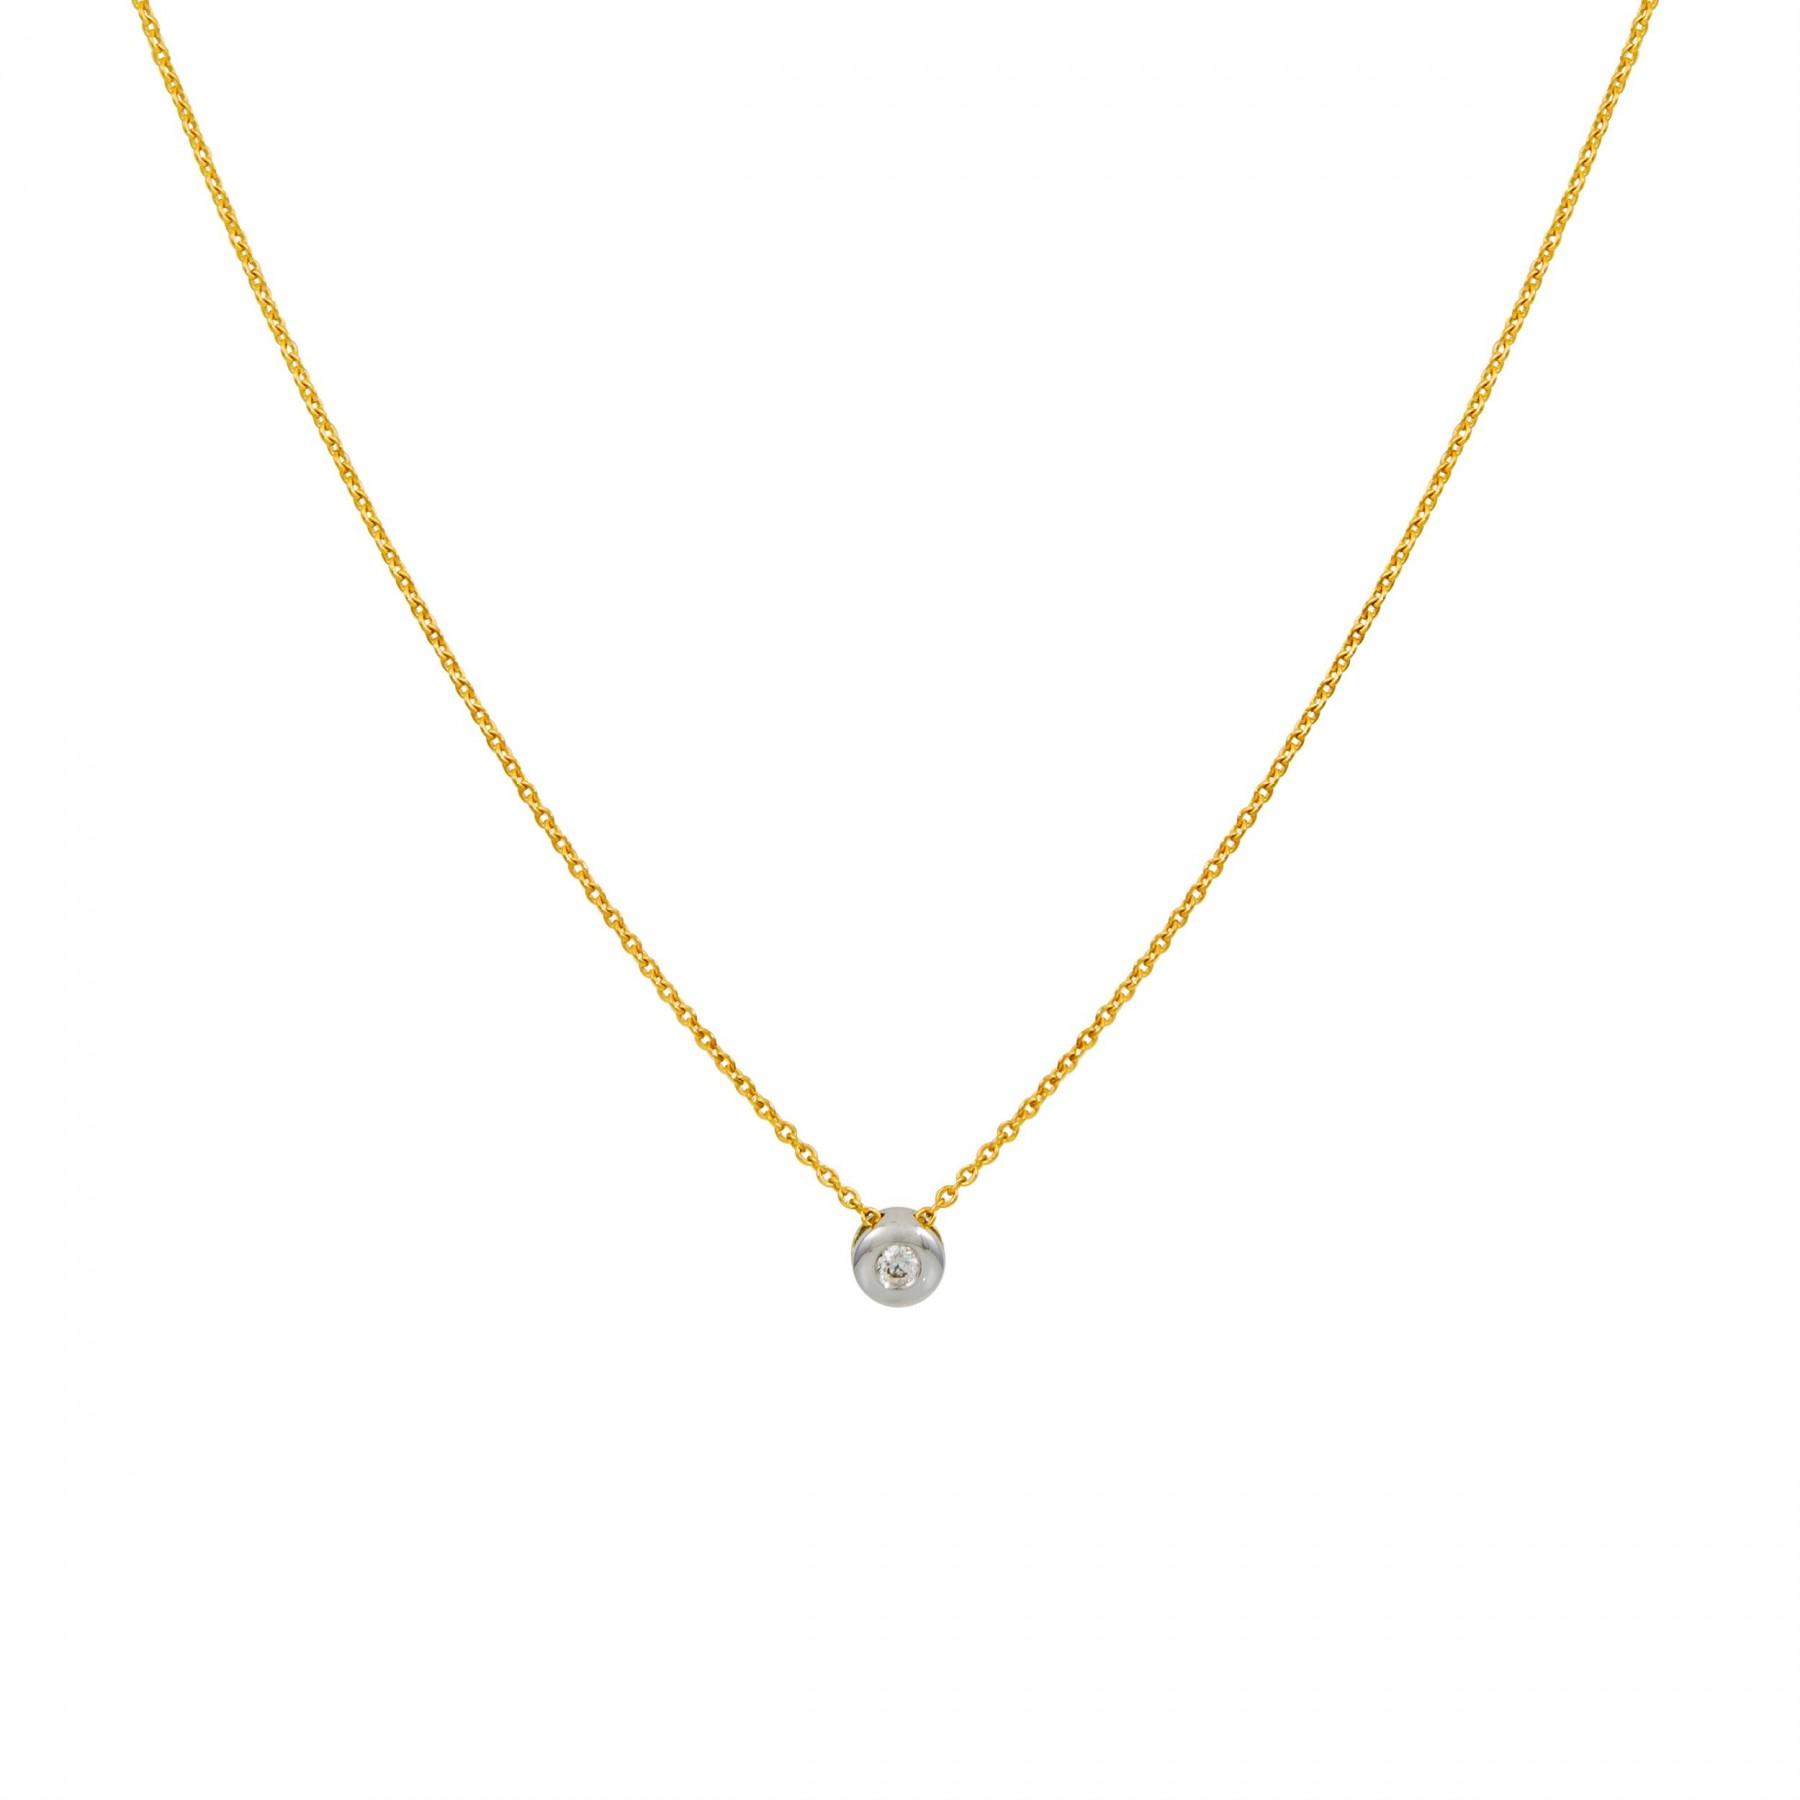 Diamant - 0.054ct - gh/si3 45 cm - ankerschakel - diamant - 0.054ct - gh/si3 202.5011.45